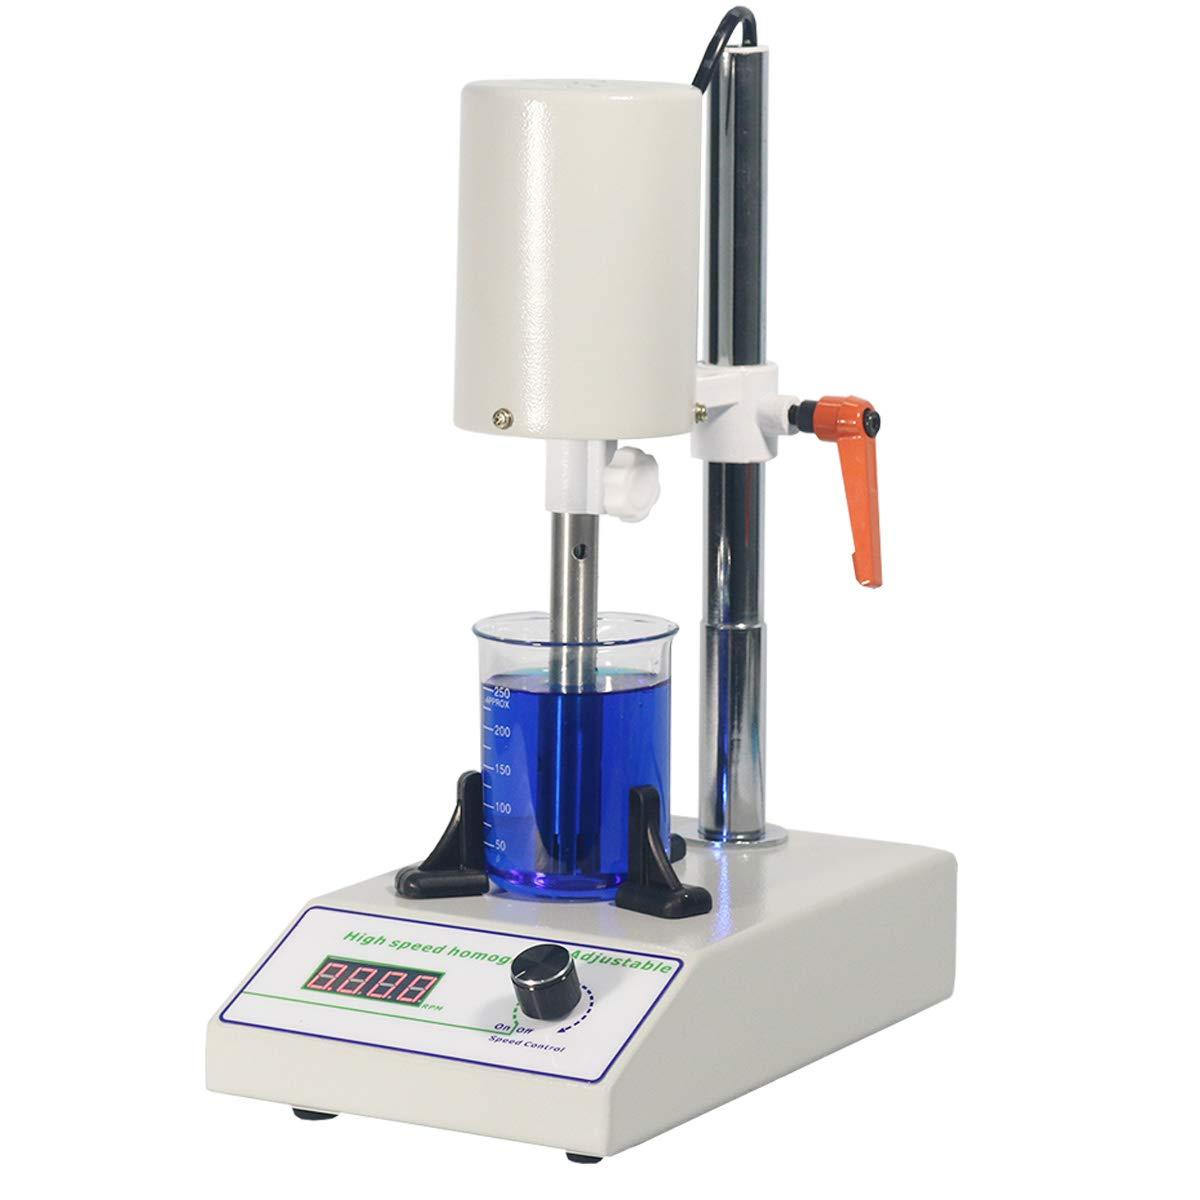 MXBAOHENG High Speed Homogenizer Adjustable Lab Disperser Emulsifier 5-2000ml w/ 1512G and 1618G Working Head (110V) by MXBAOHENG